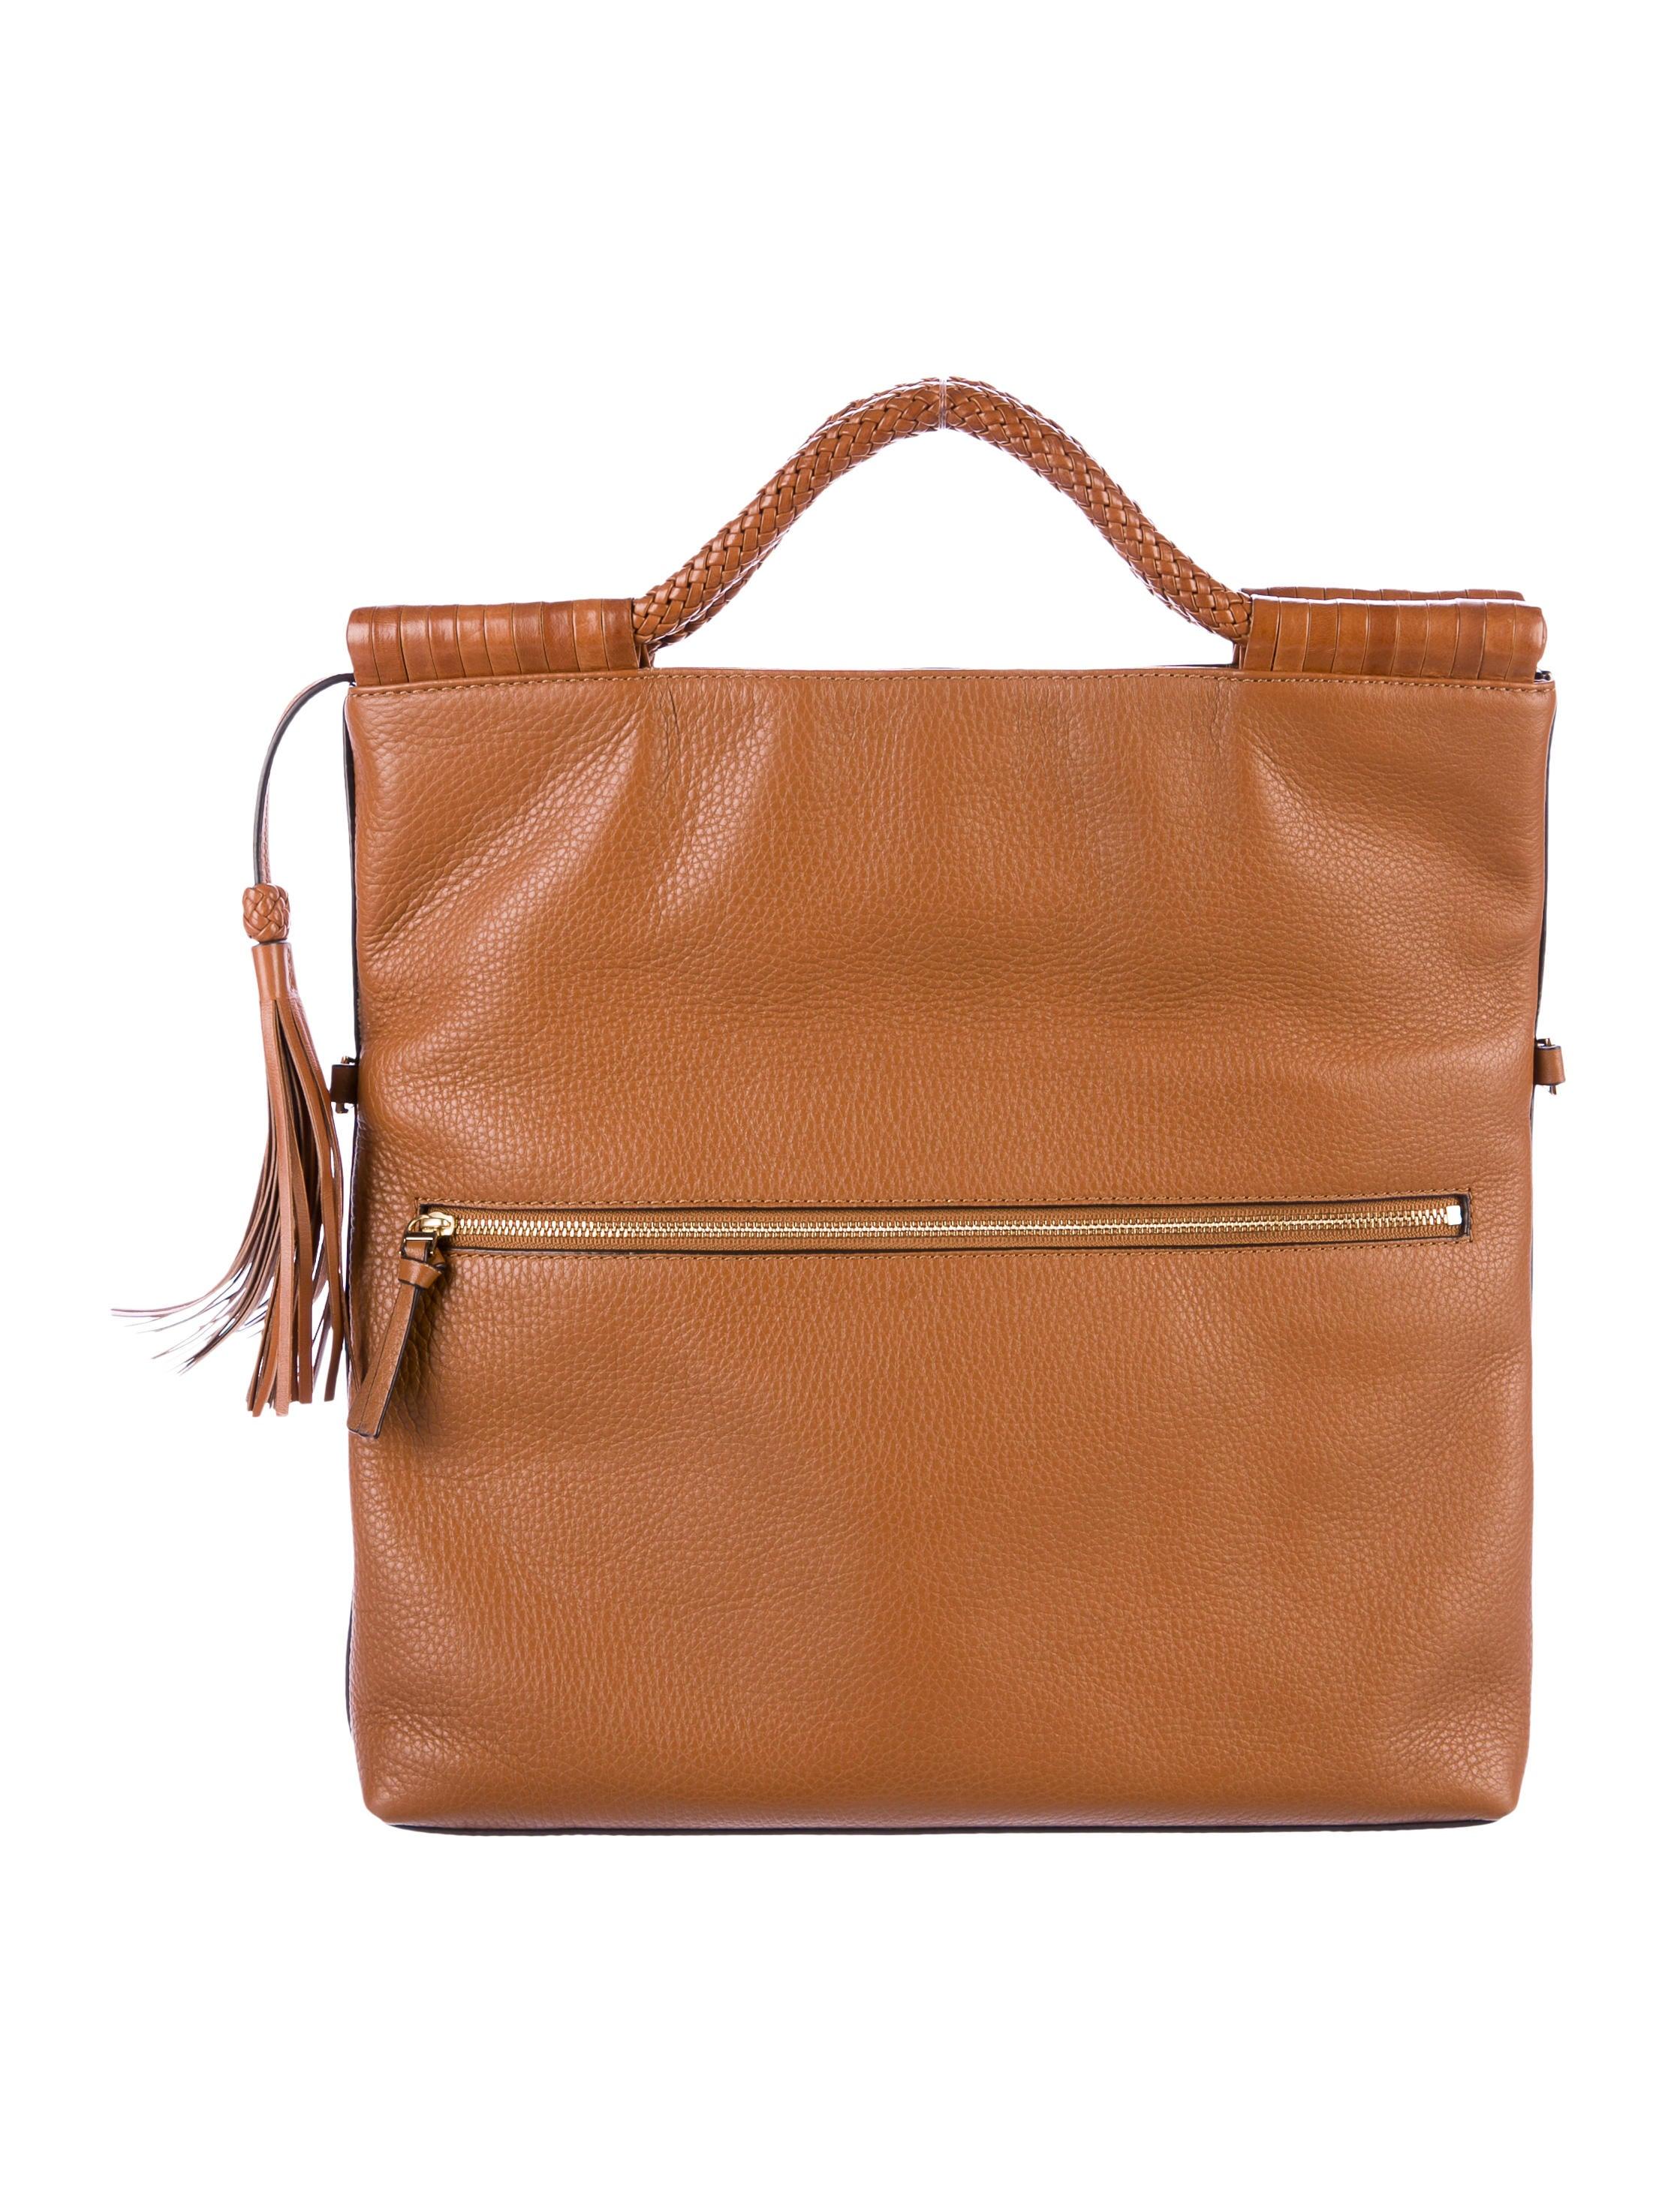 Tory Burch Taylor Convertible Fold Over Crossbody Bag